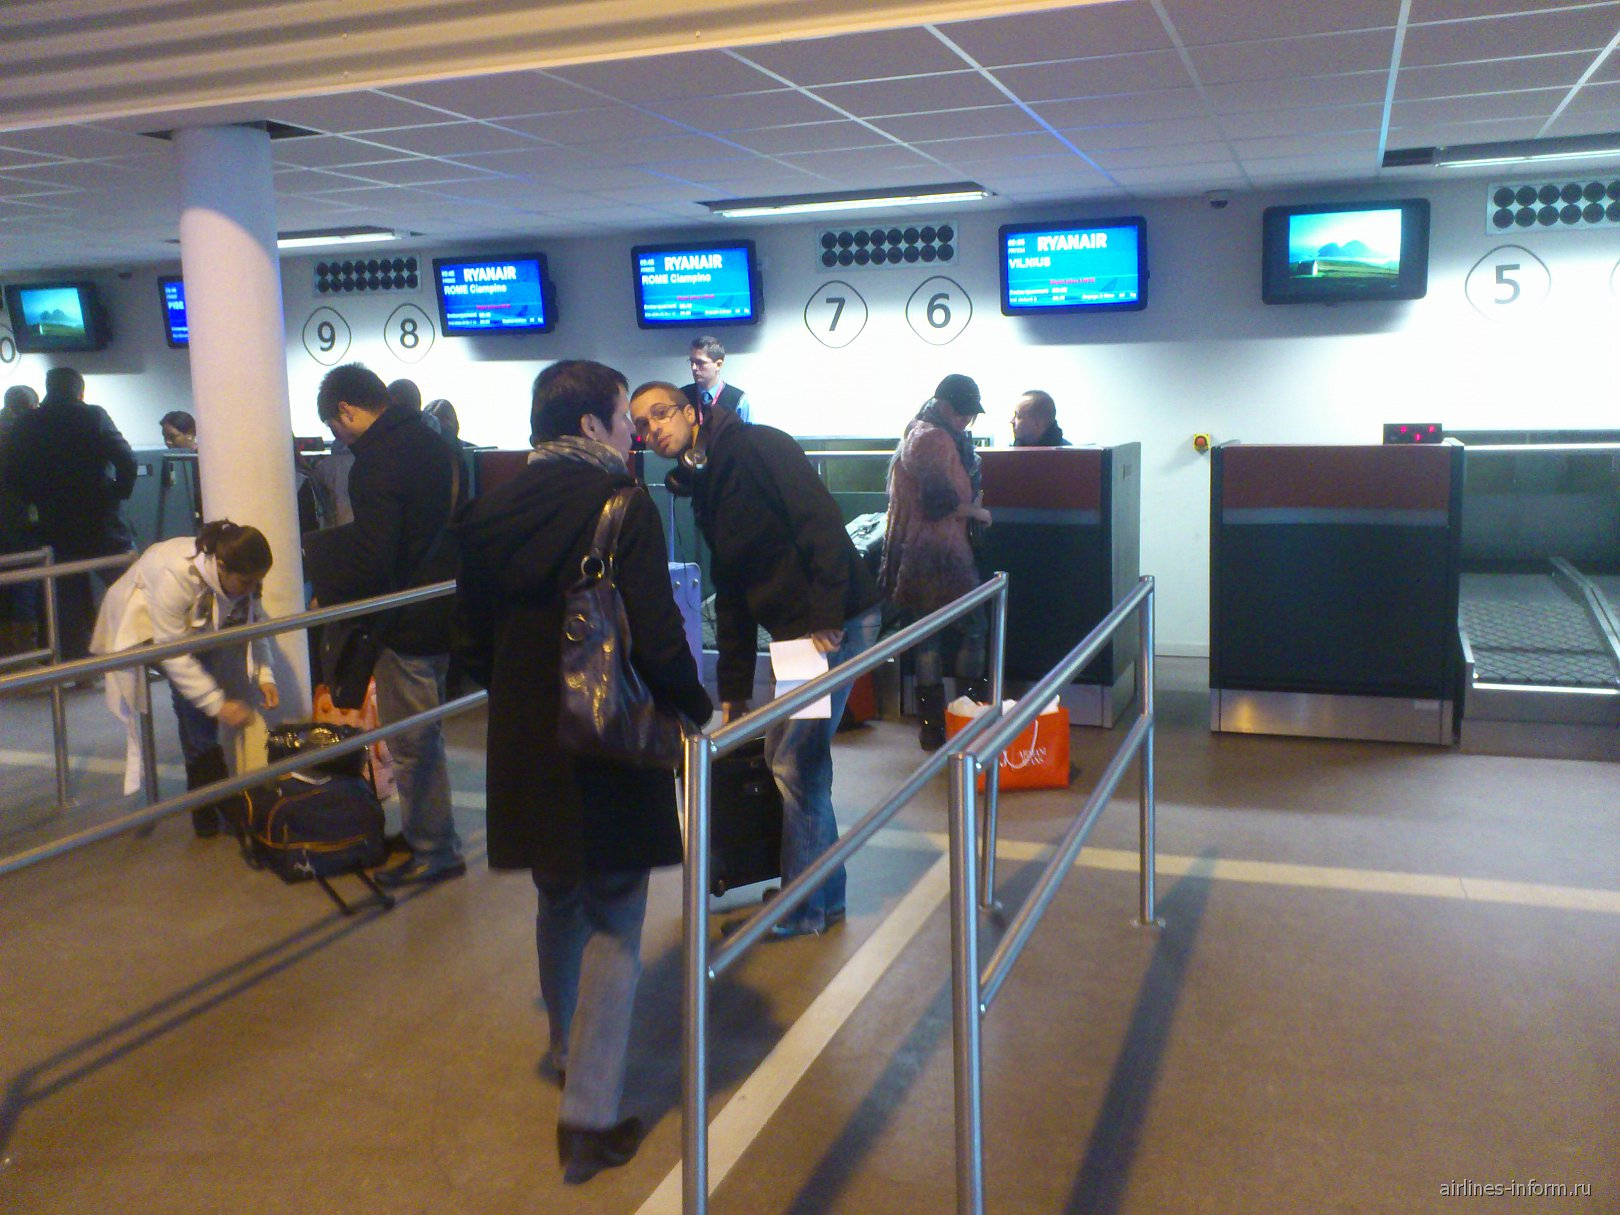 Регистрация на рейс Ryanair в аэропорту Париж Бове